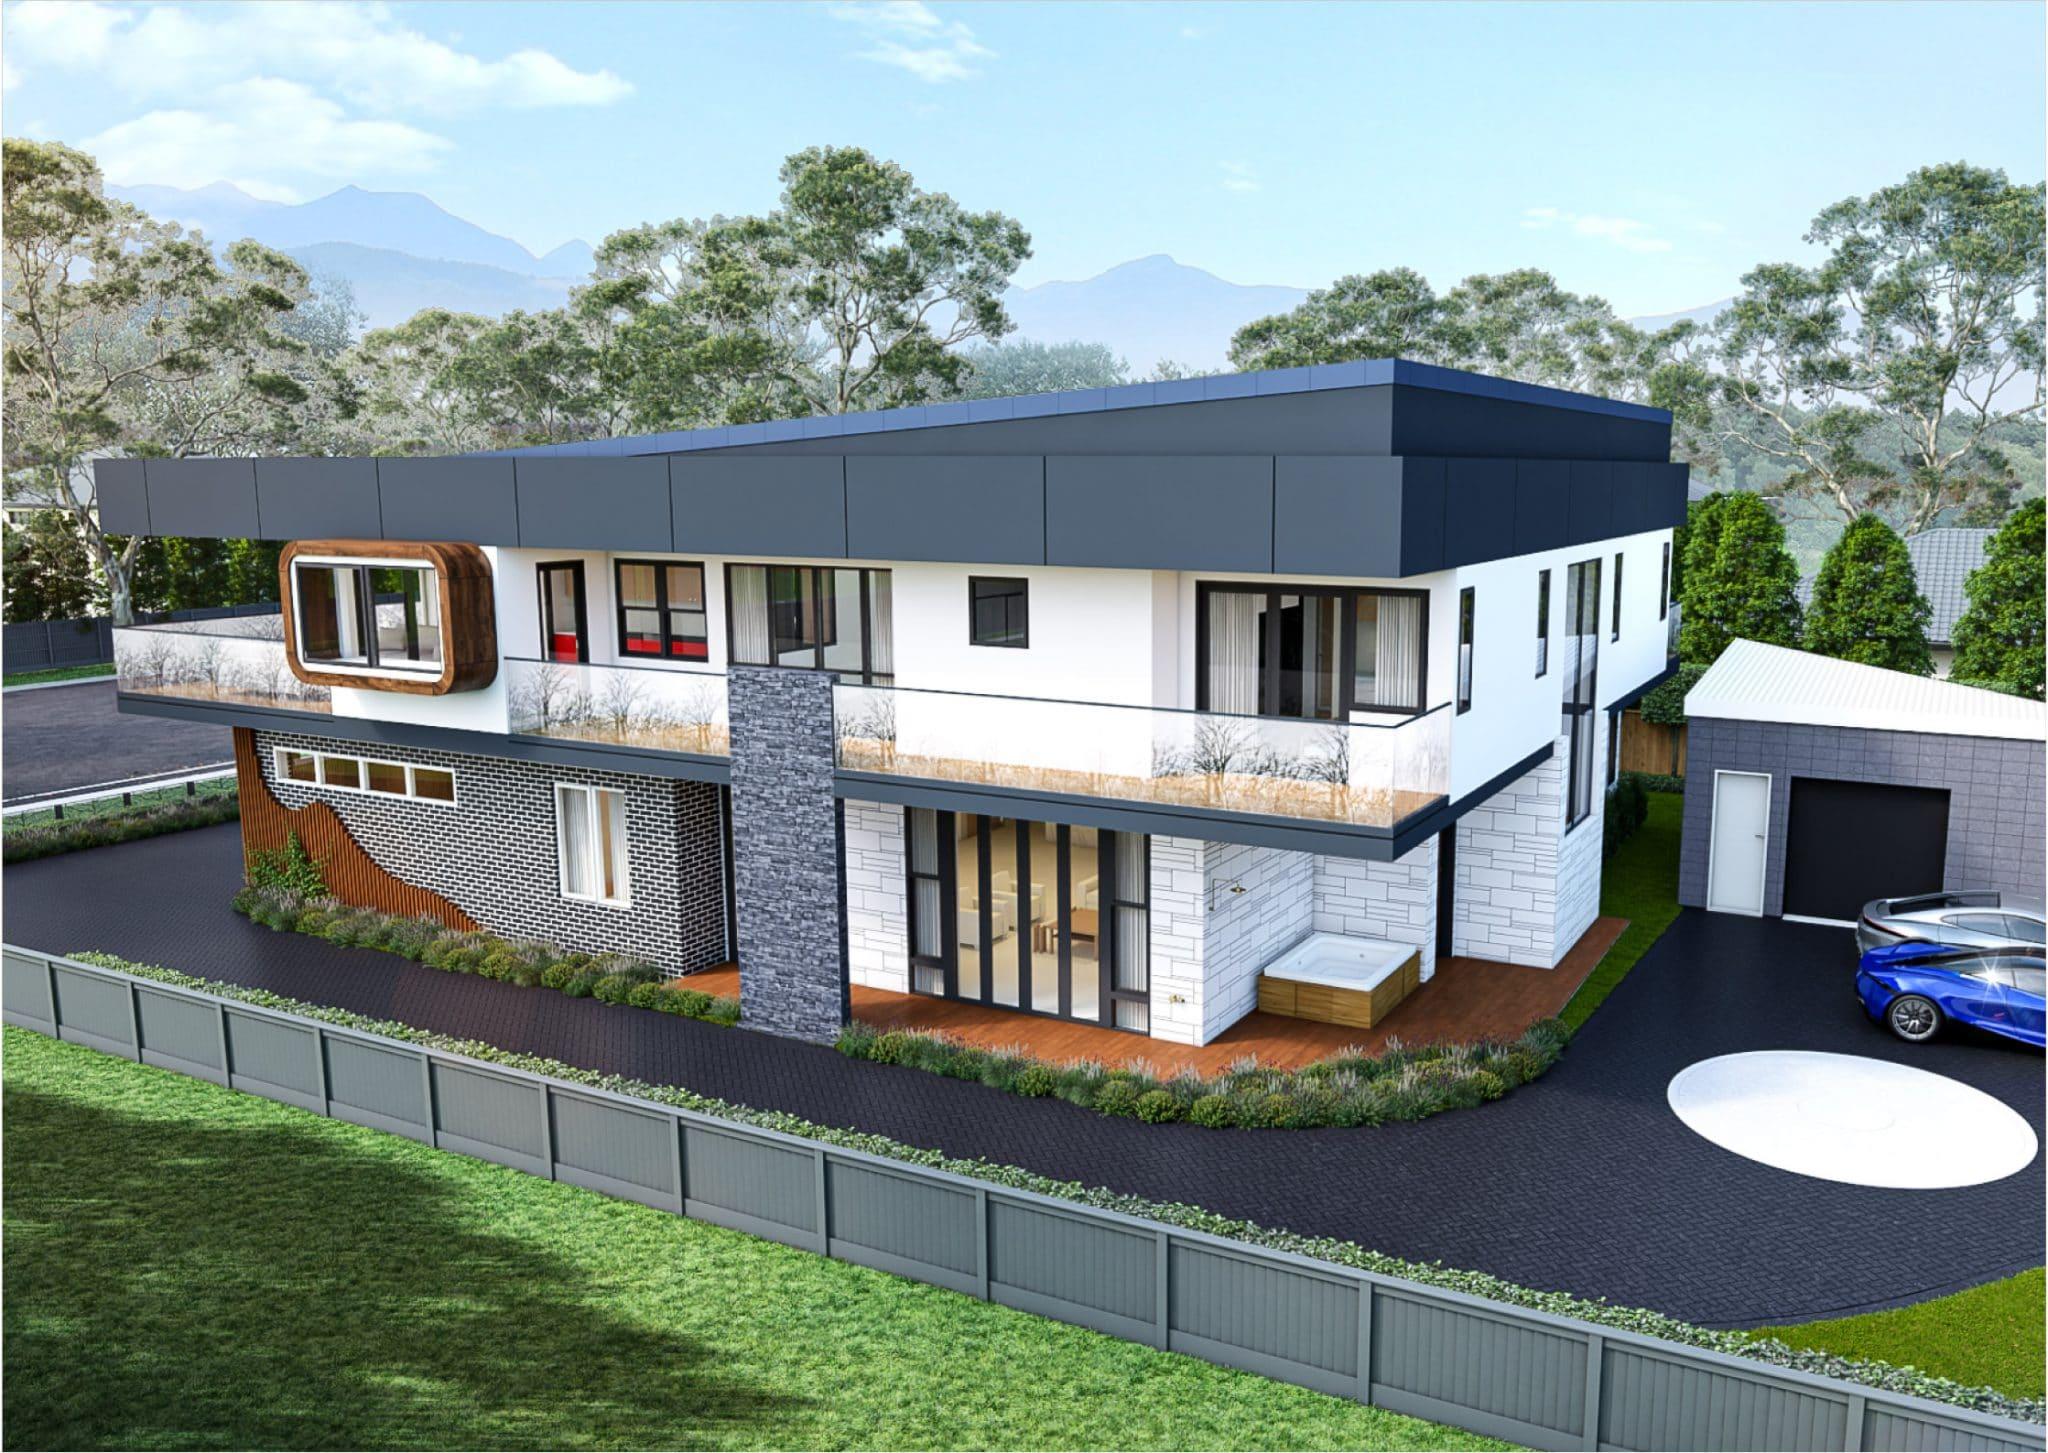 New-Zealand-Home-img-2